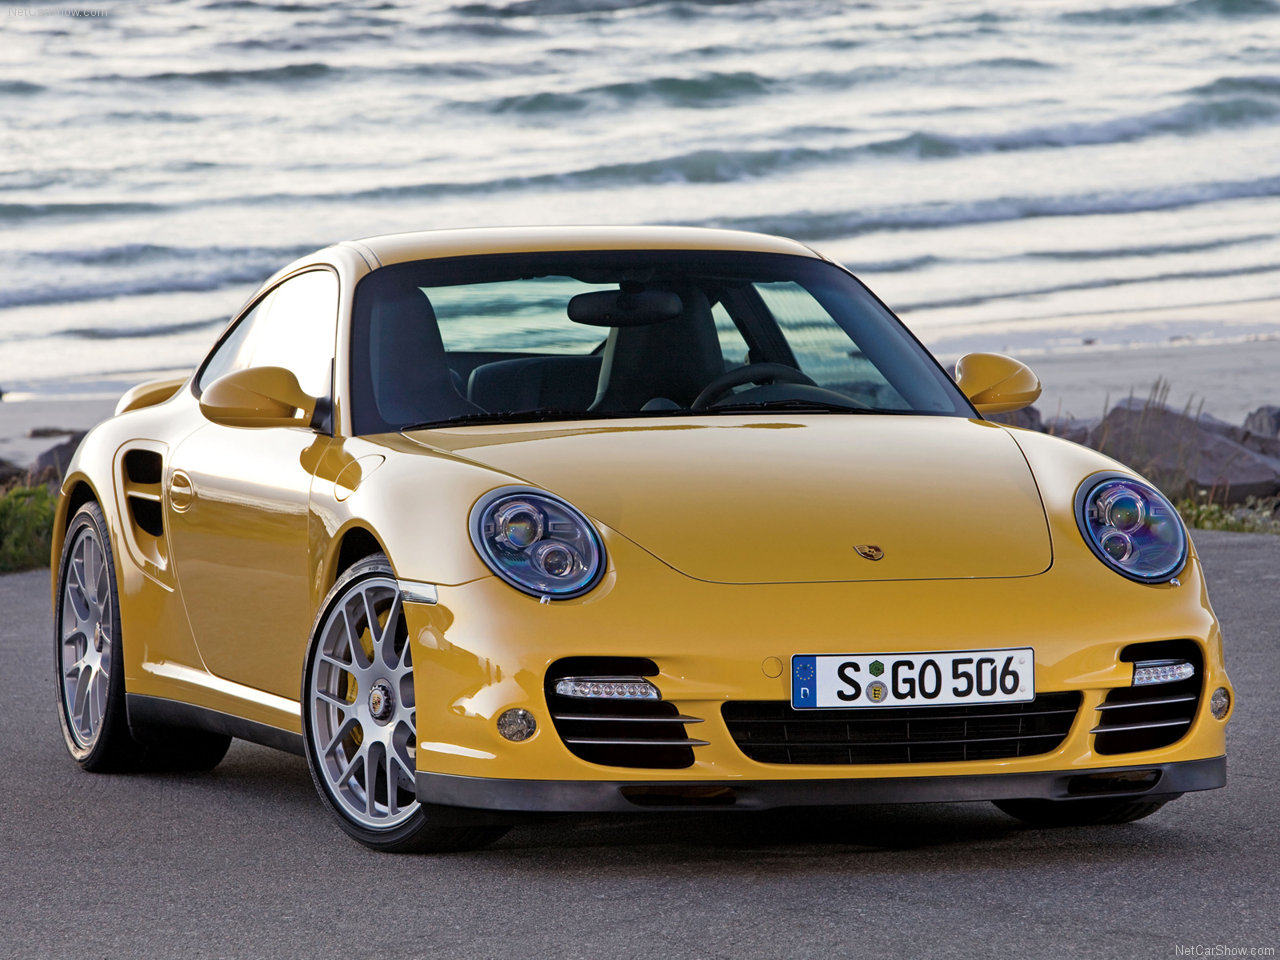 PORSCHE 911 TURBO 2010 WALLPAPER Top Car Wallpapers 1280x960